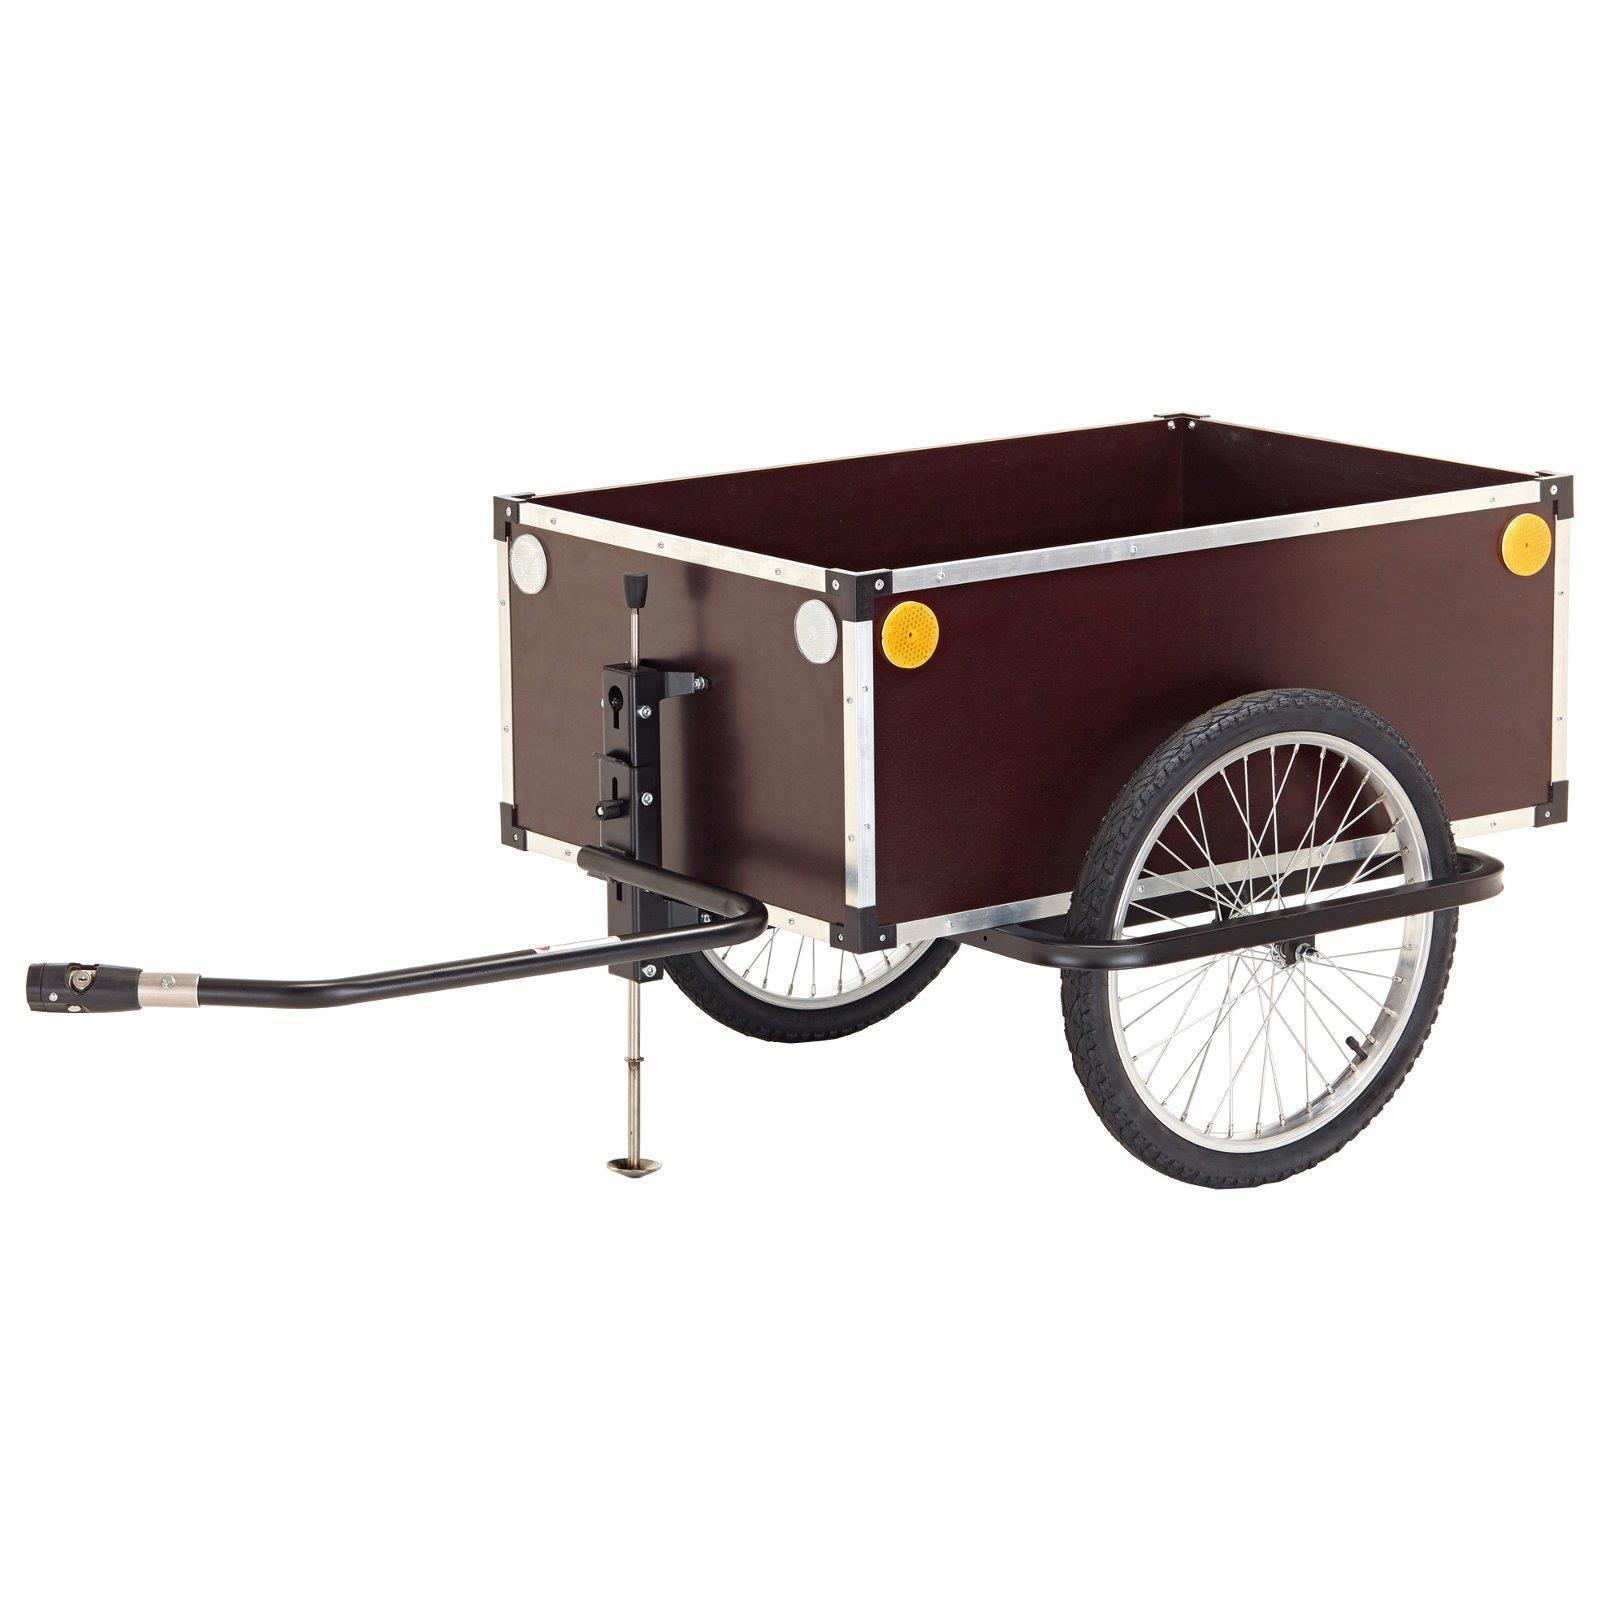 Roland jumbo remolque de bicicleta Cocherito de mano 175l transporte embrague tiefdeichsel 20